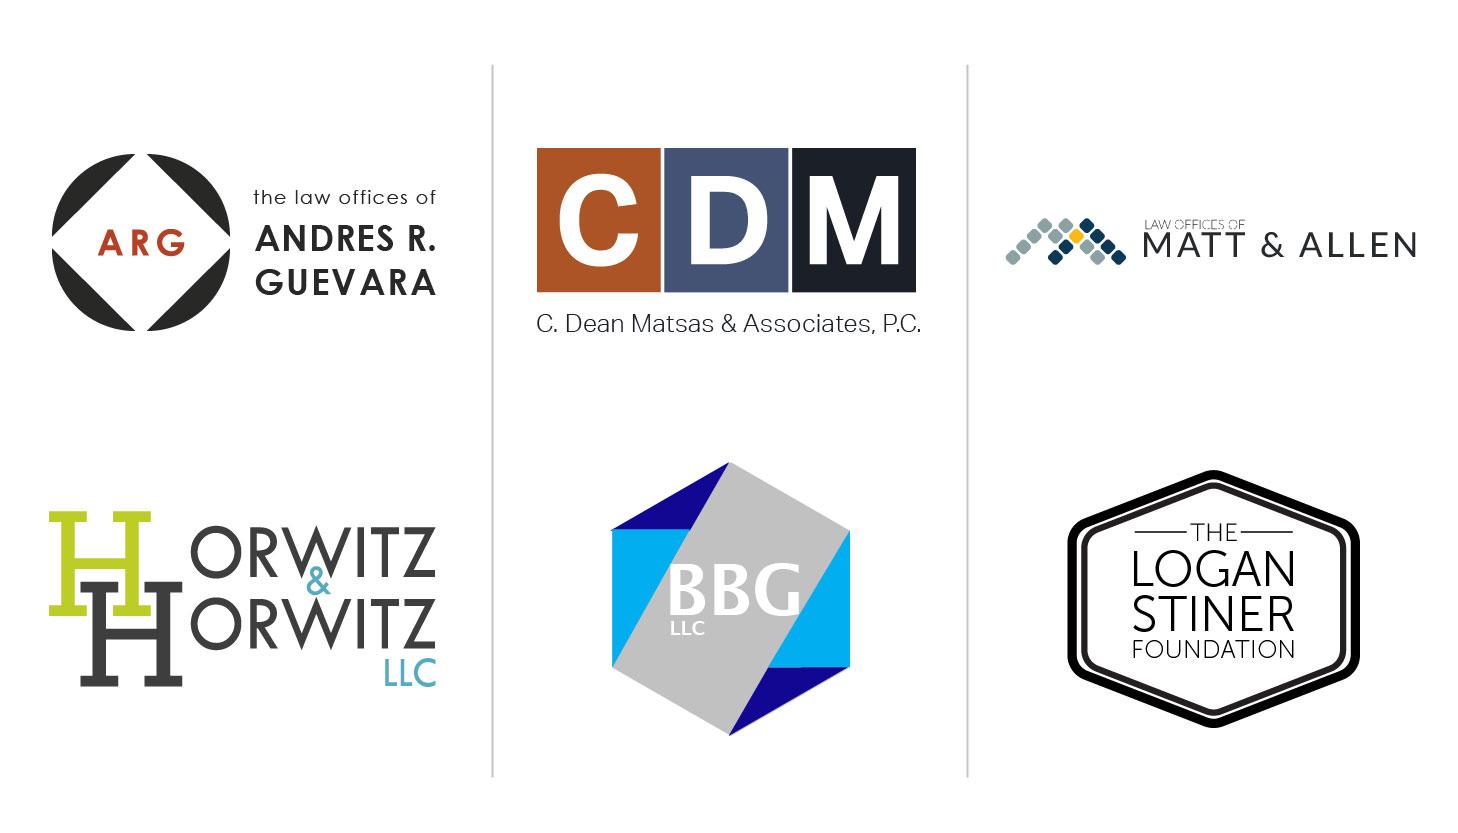 Brand Identity Concepts | Luke Sillies Design